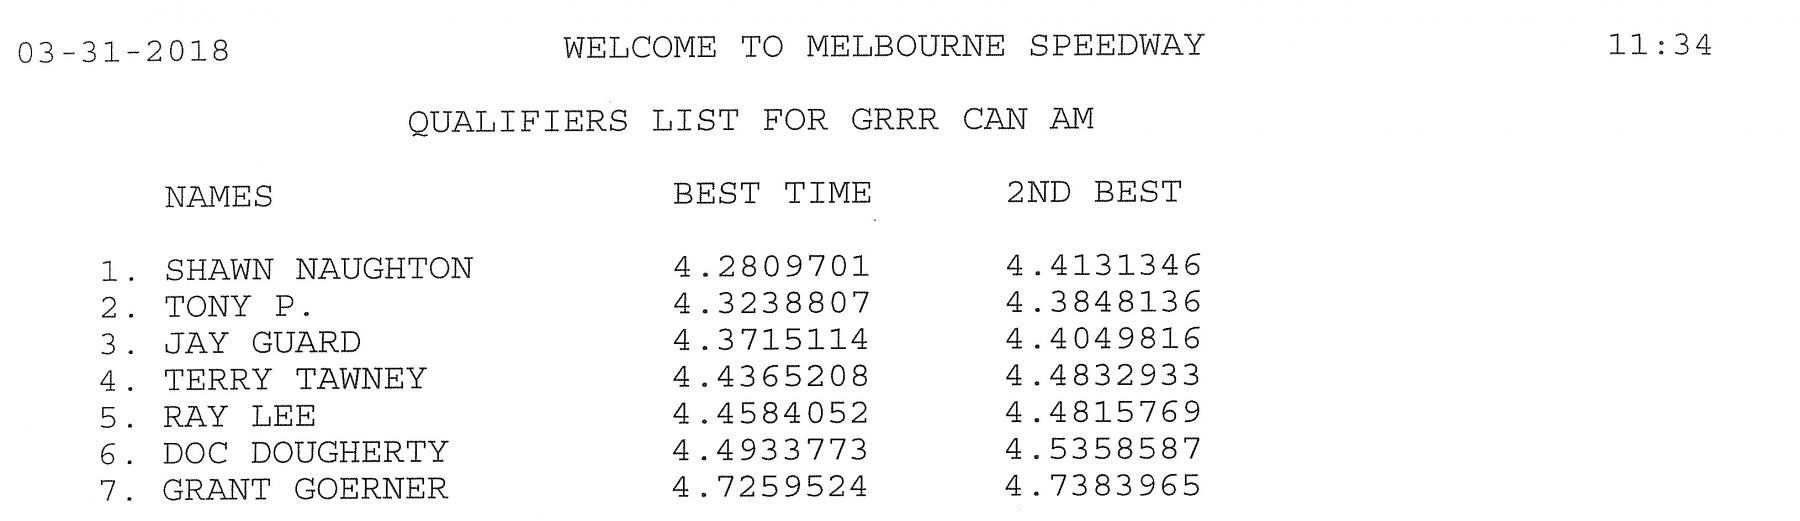 3.31.18 GRRR Can-Am Qualifying Results.jpg